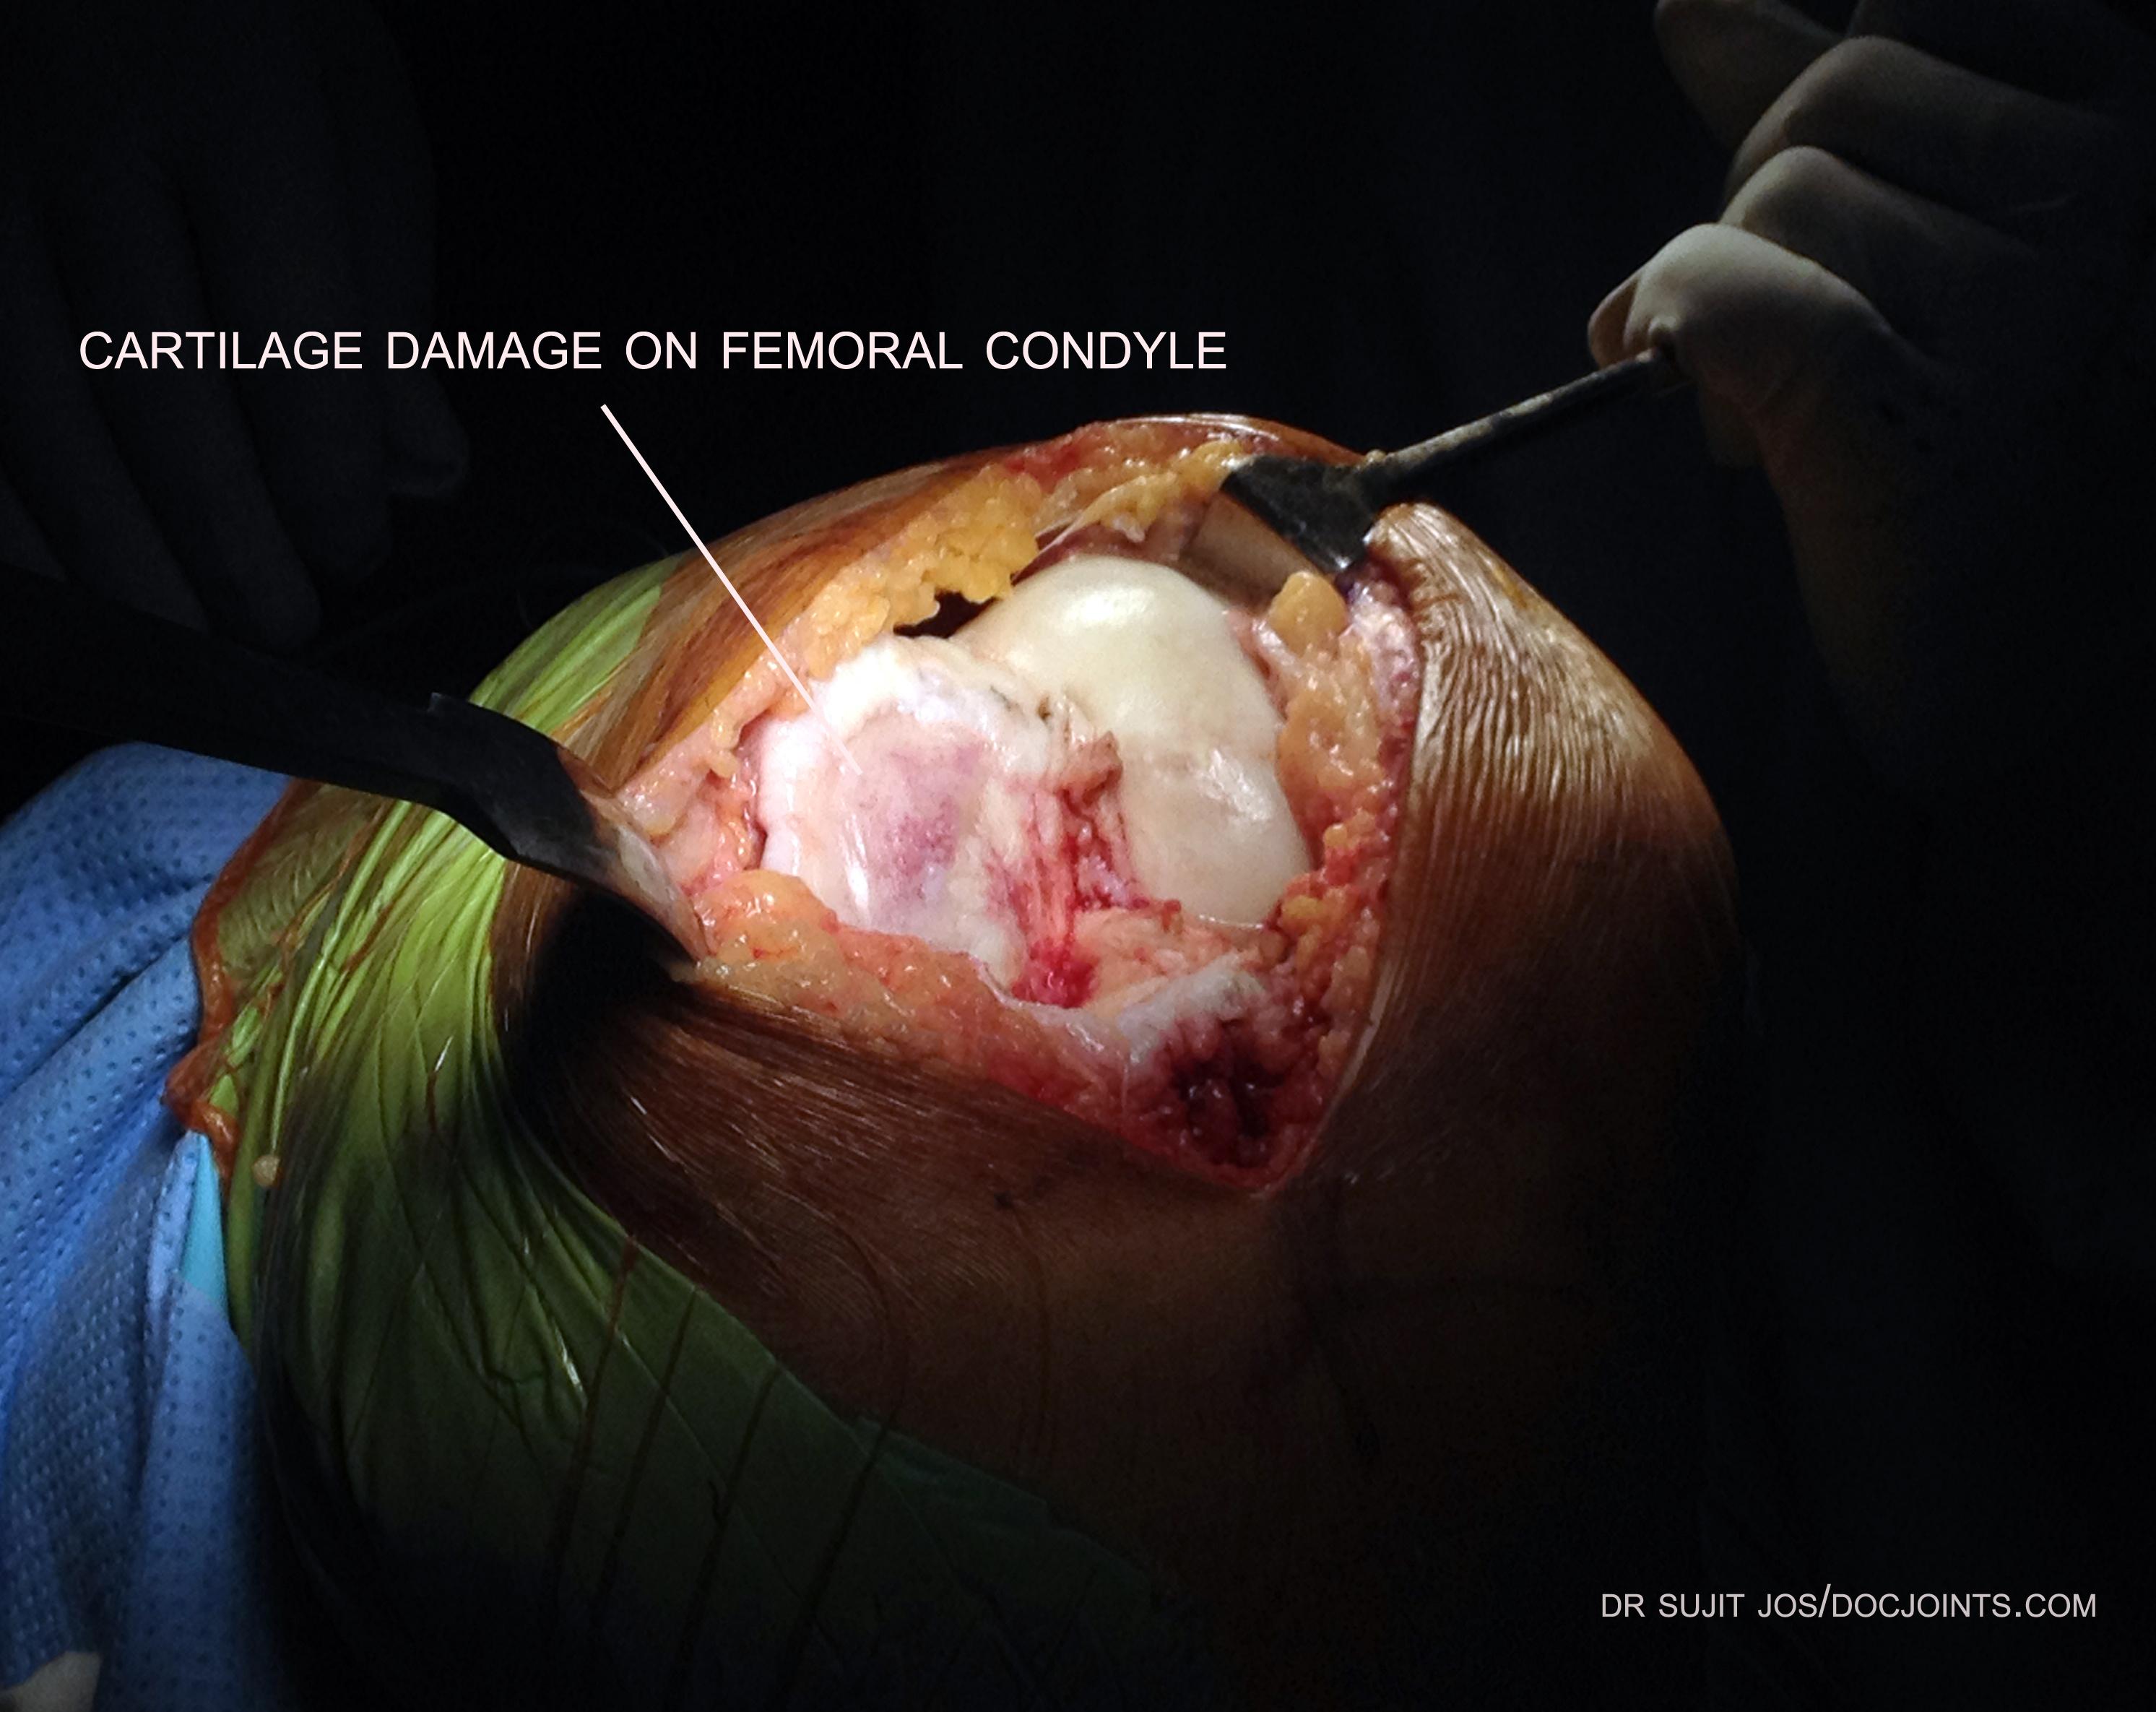 oa knee after opening intraop